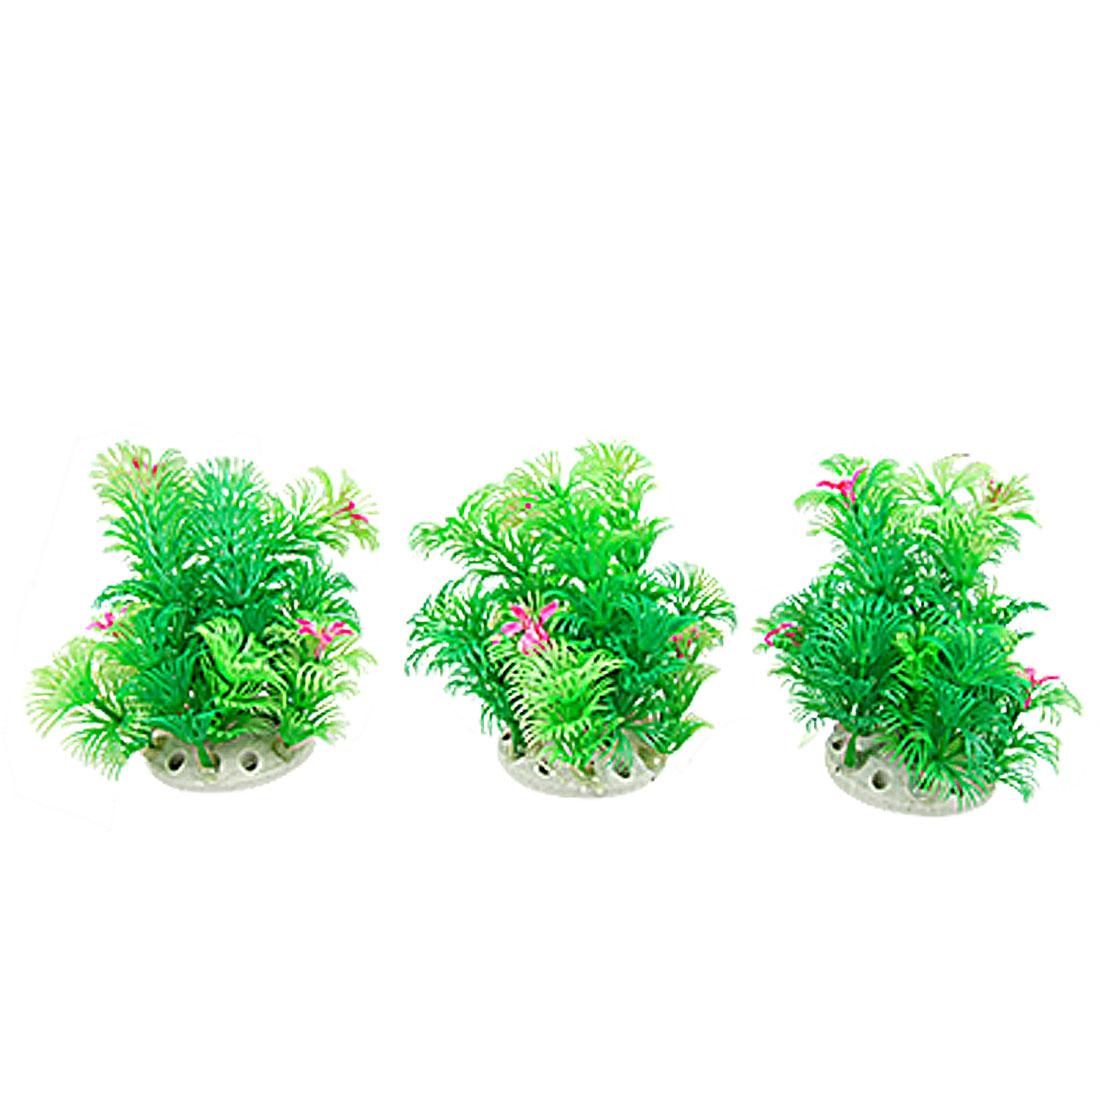 3 Pieces Plastic Short Grass w Flowers Aquarium Ornament